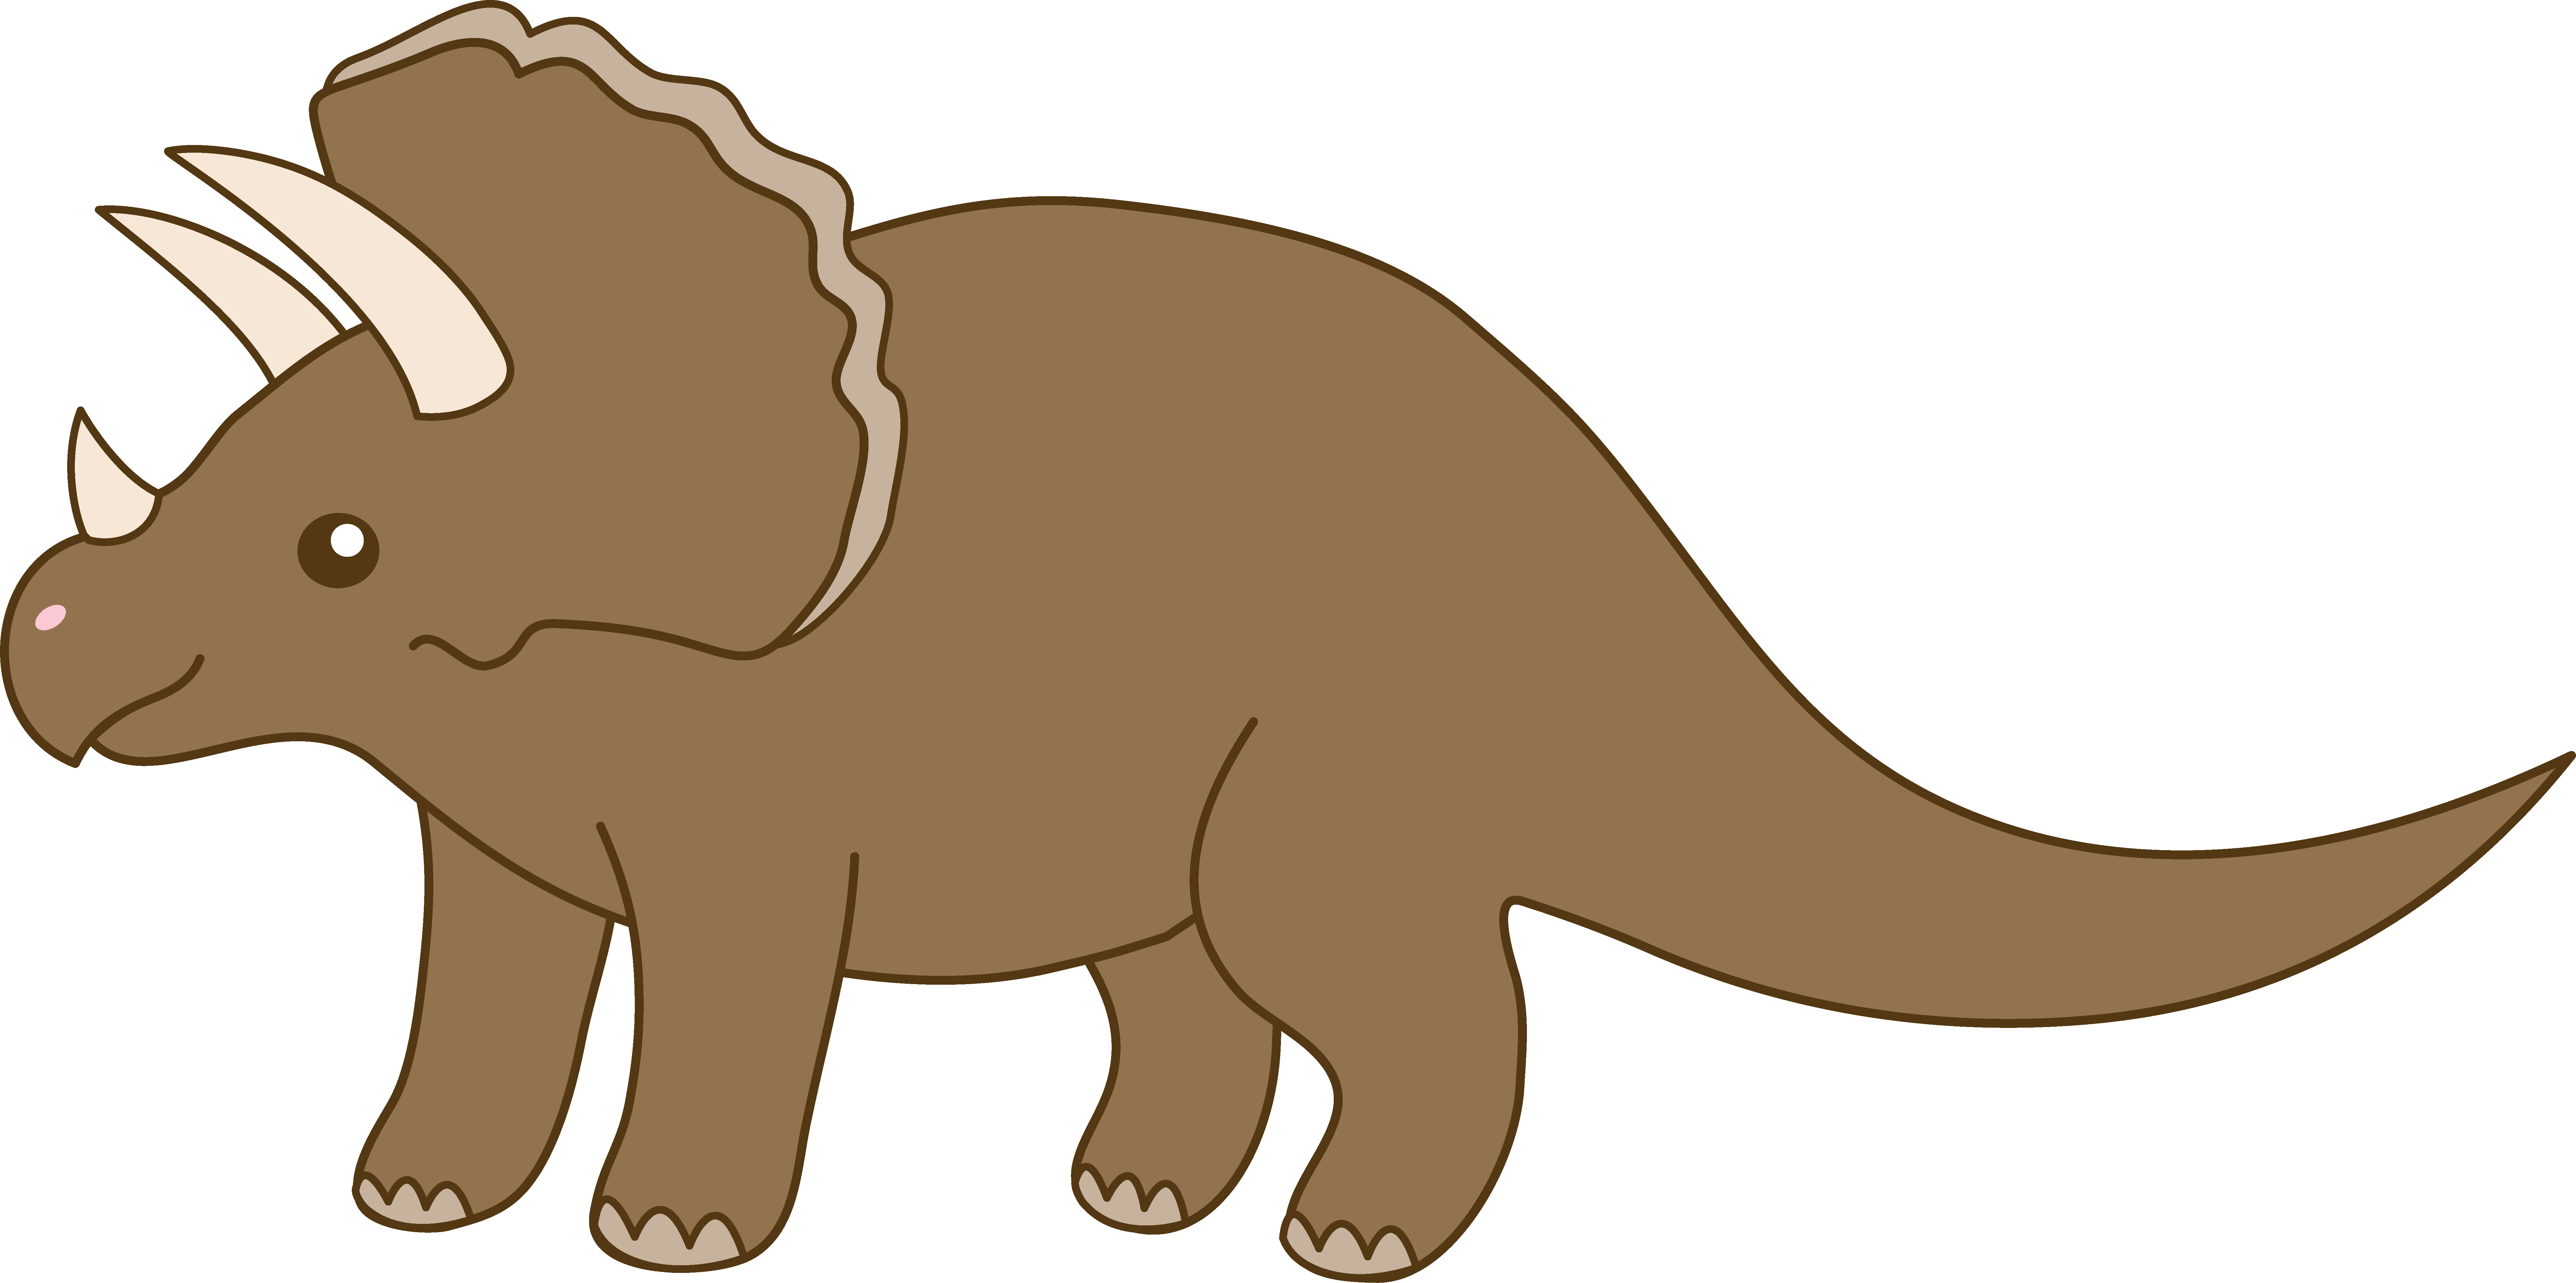 Dinosaur clip art free. Politics clipart entertaining speech